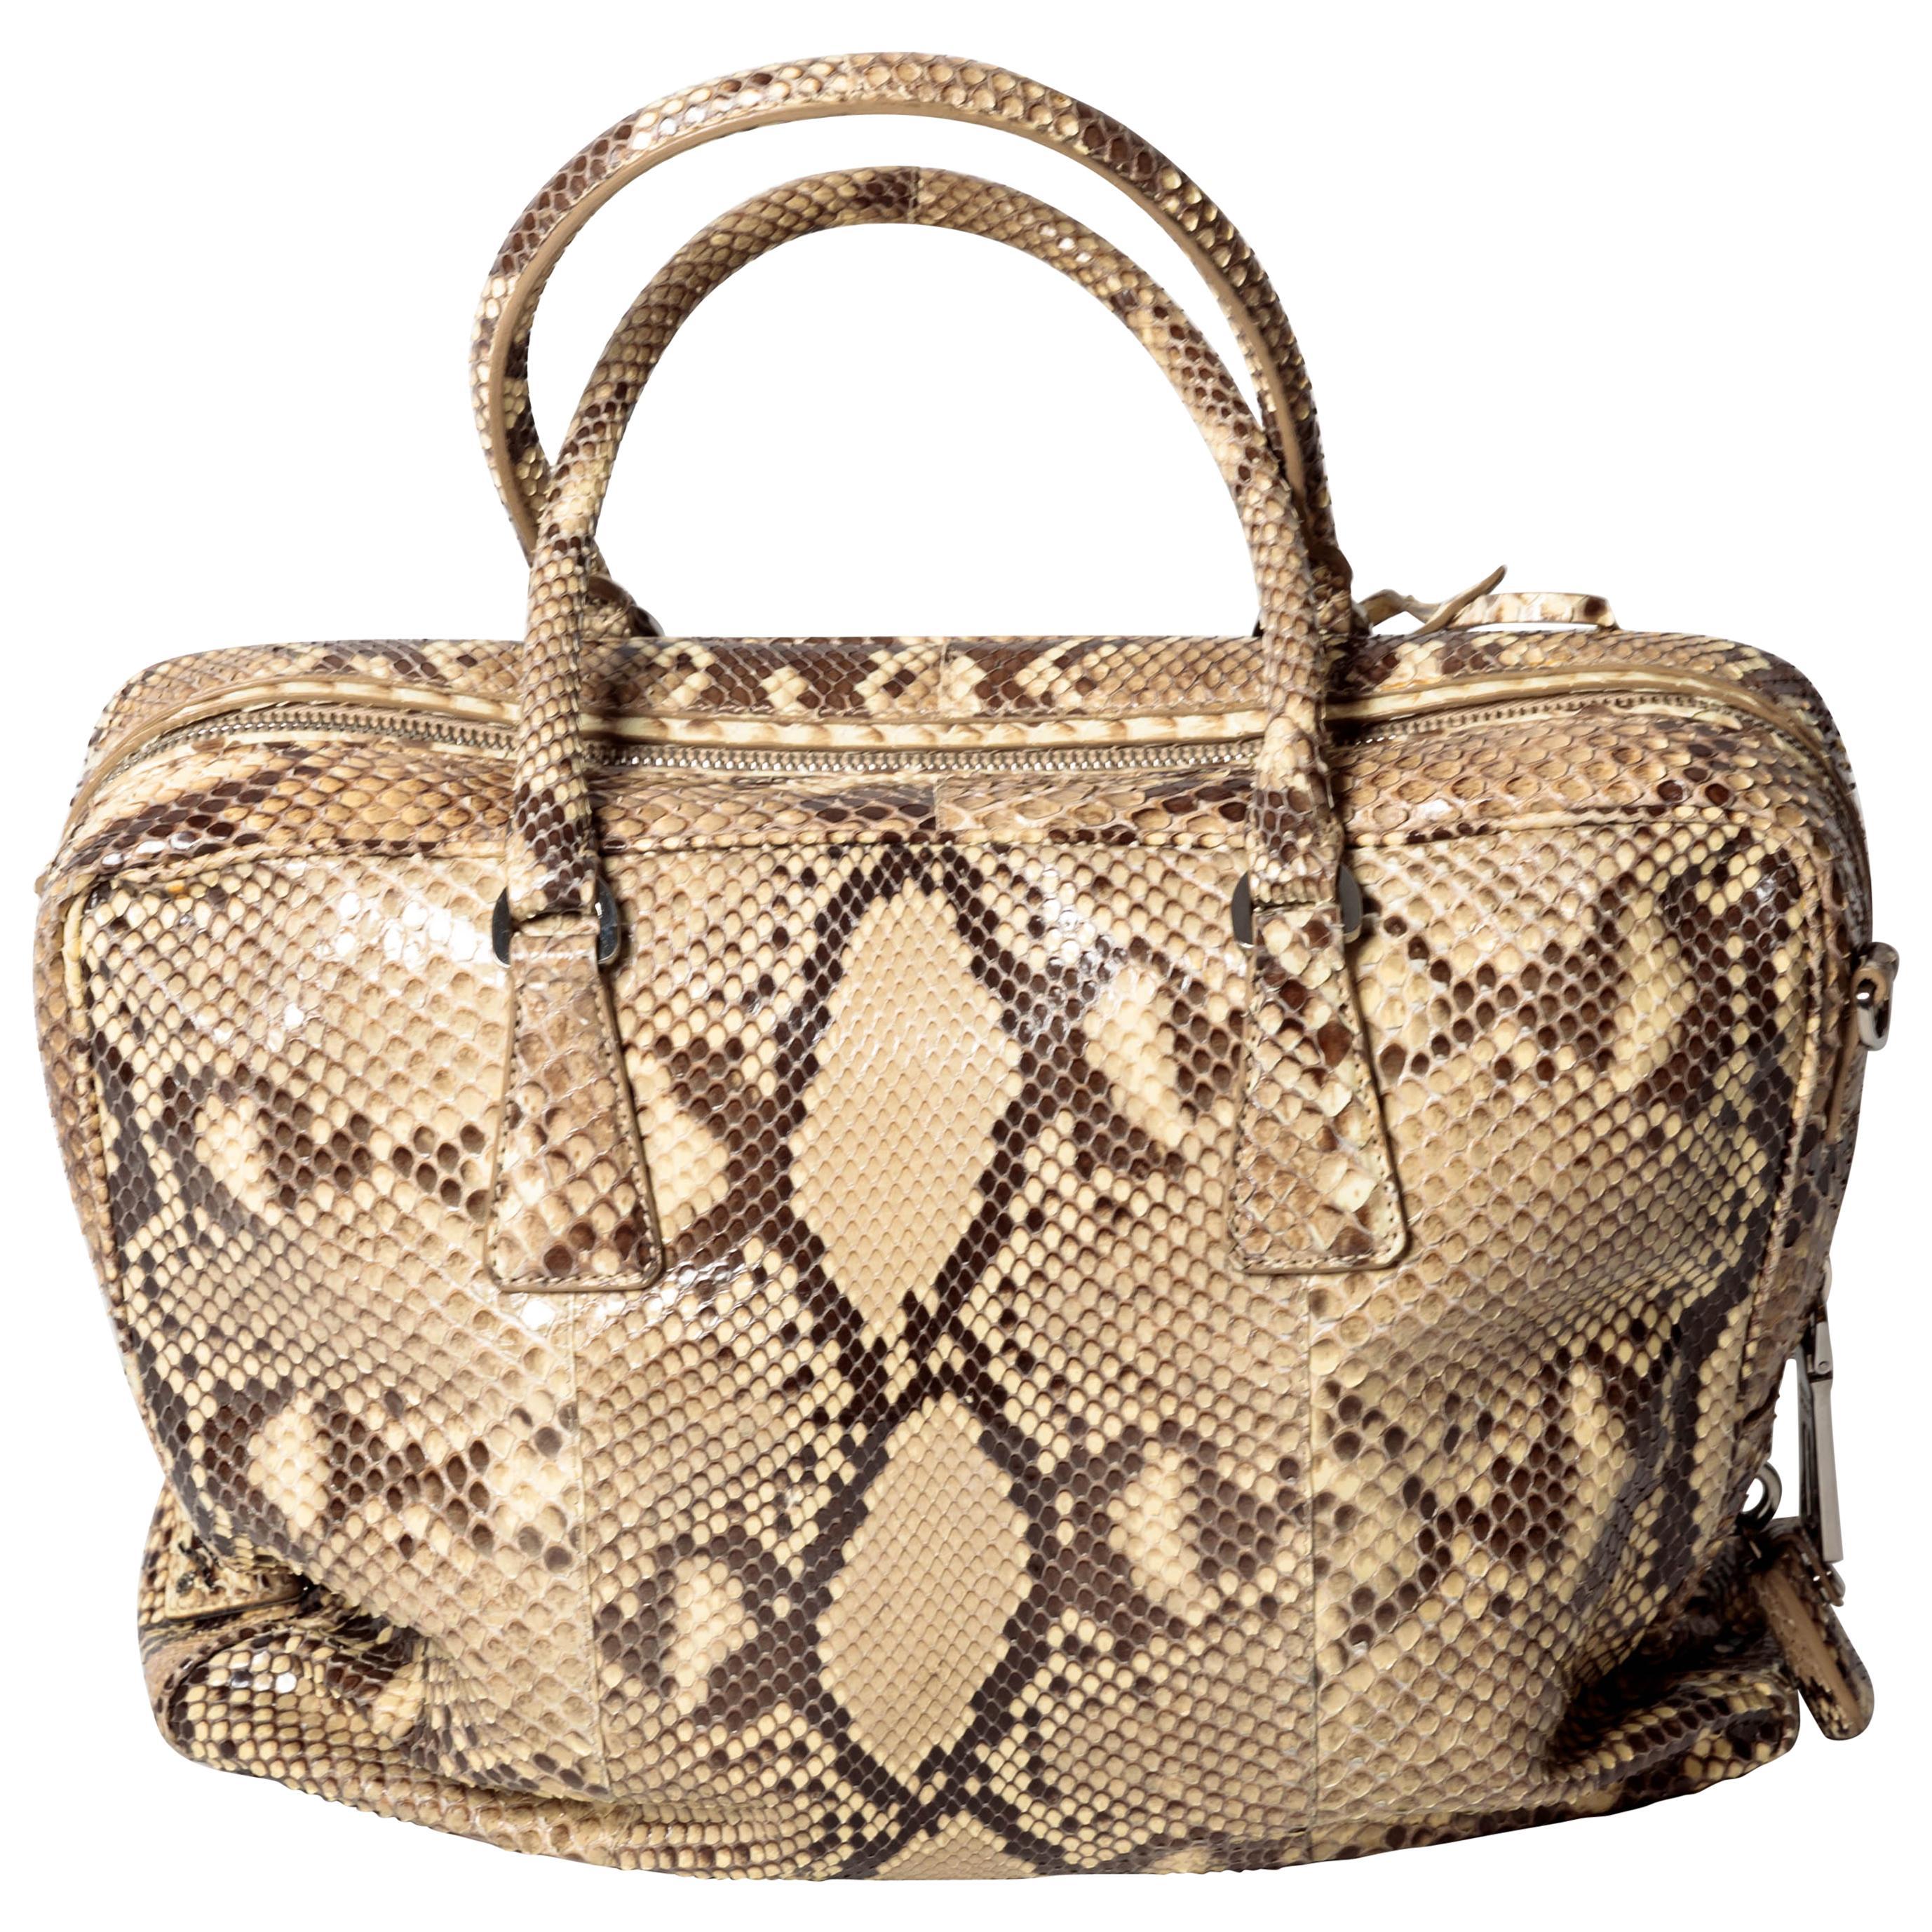 611dd020b16b ... reduced prada python bag with detachable shoulder strap and silver  hardware 8d672 08768